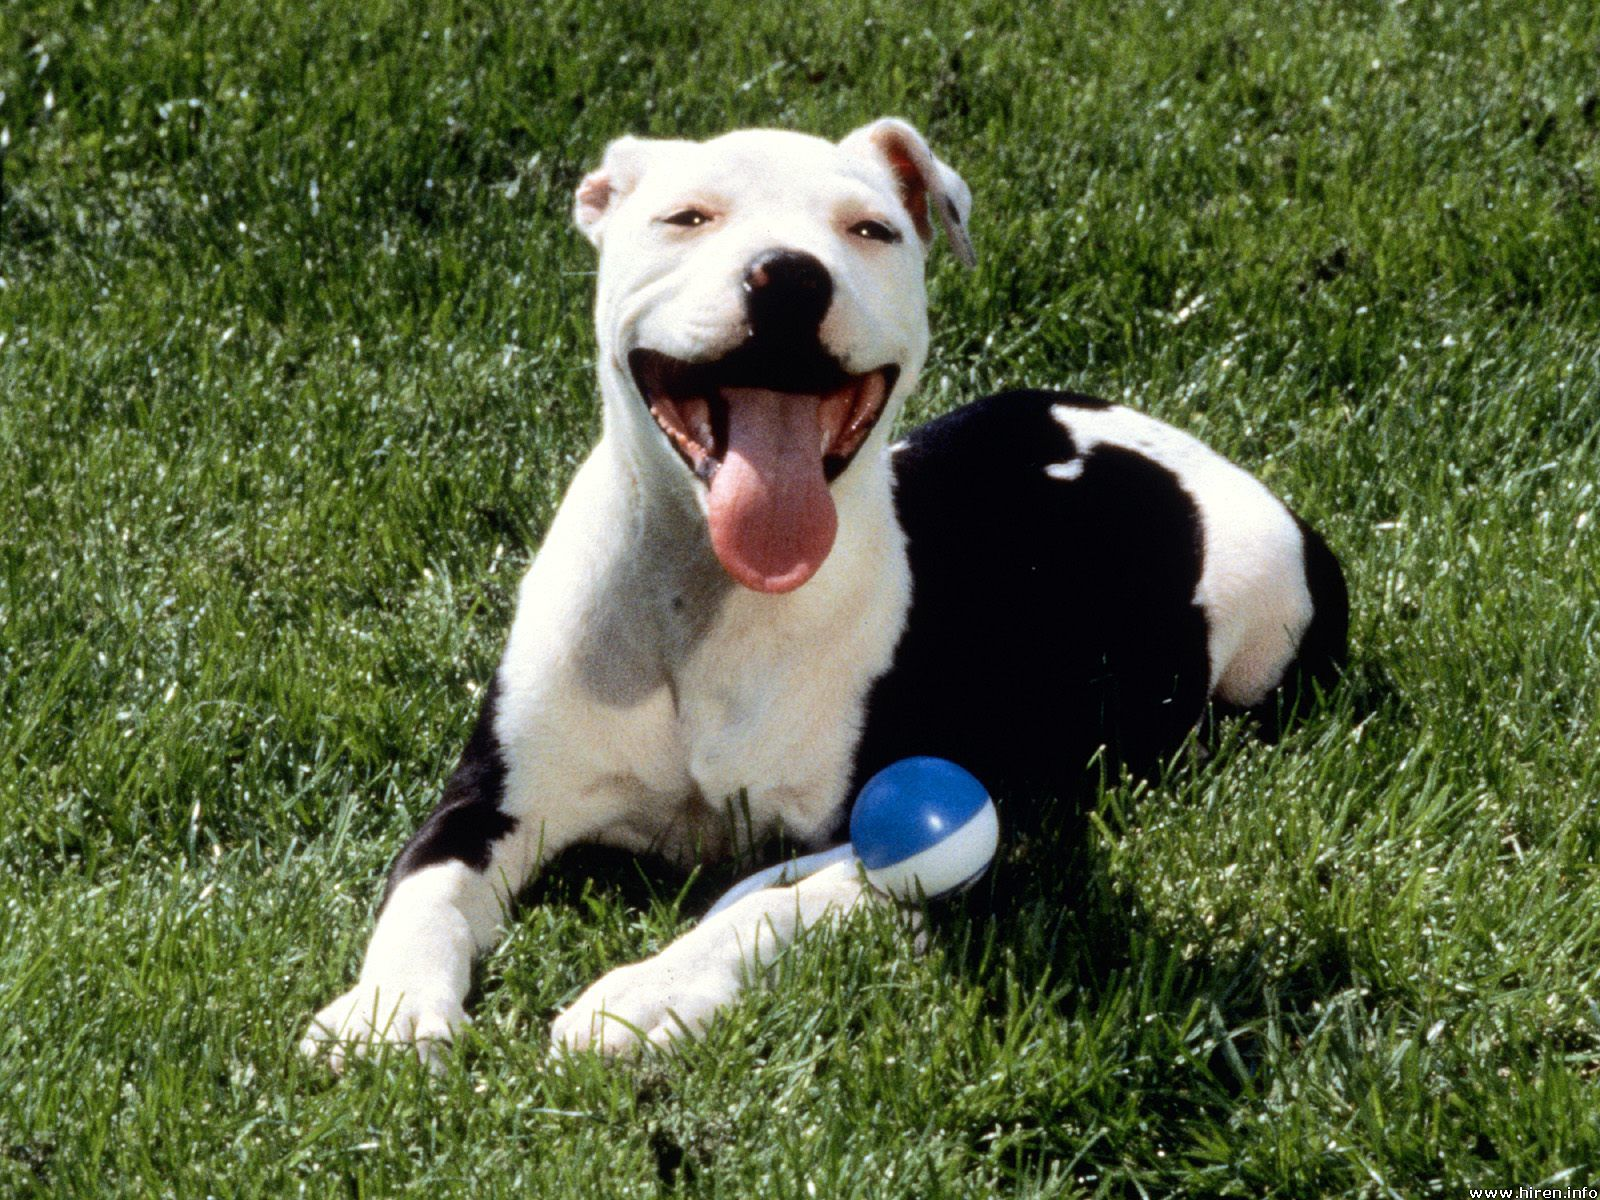 Photos Pitbull Dogs - Perros PitbullBlack And White Pitbull Dogs